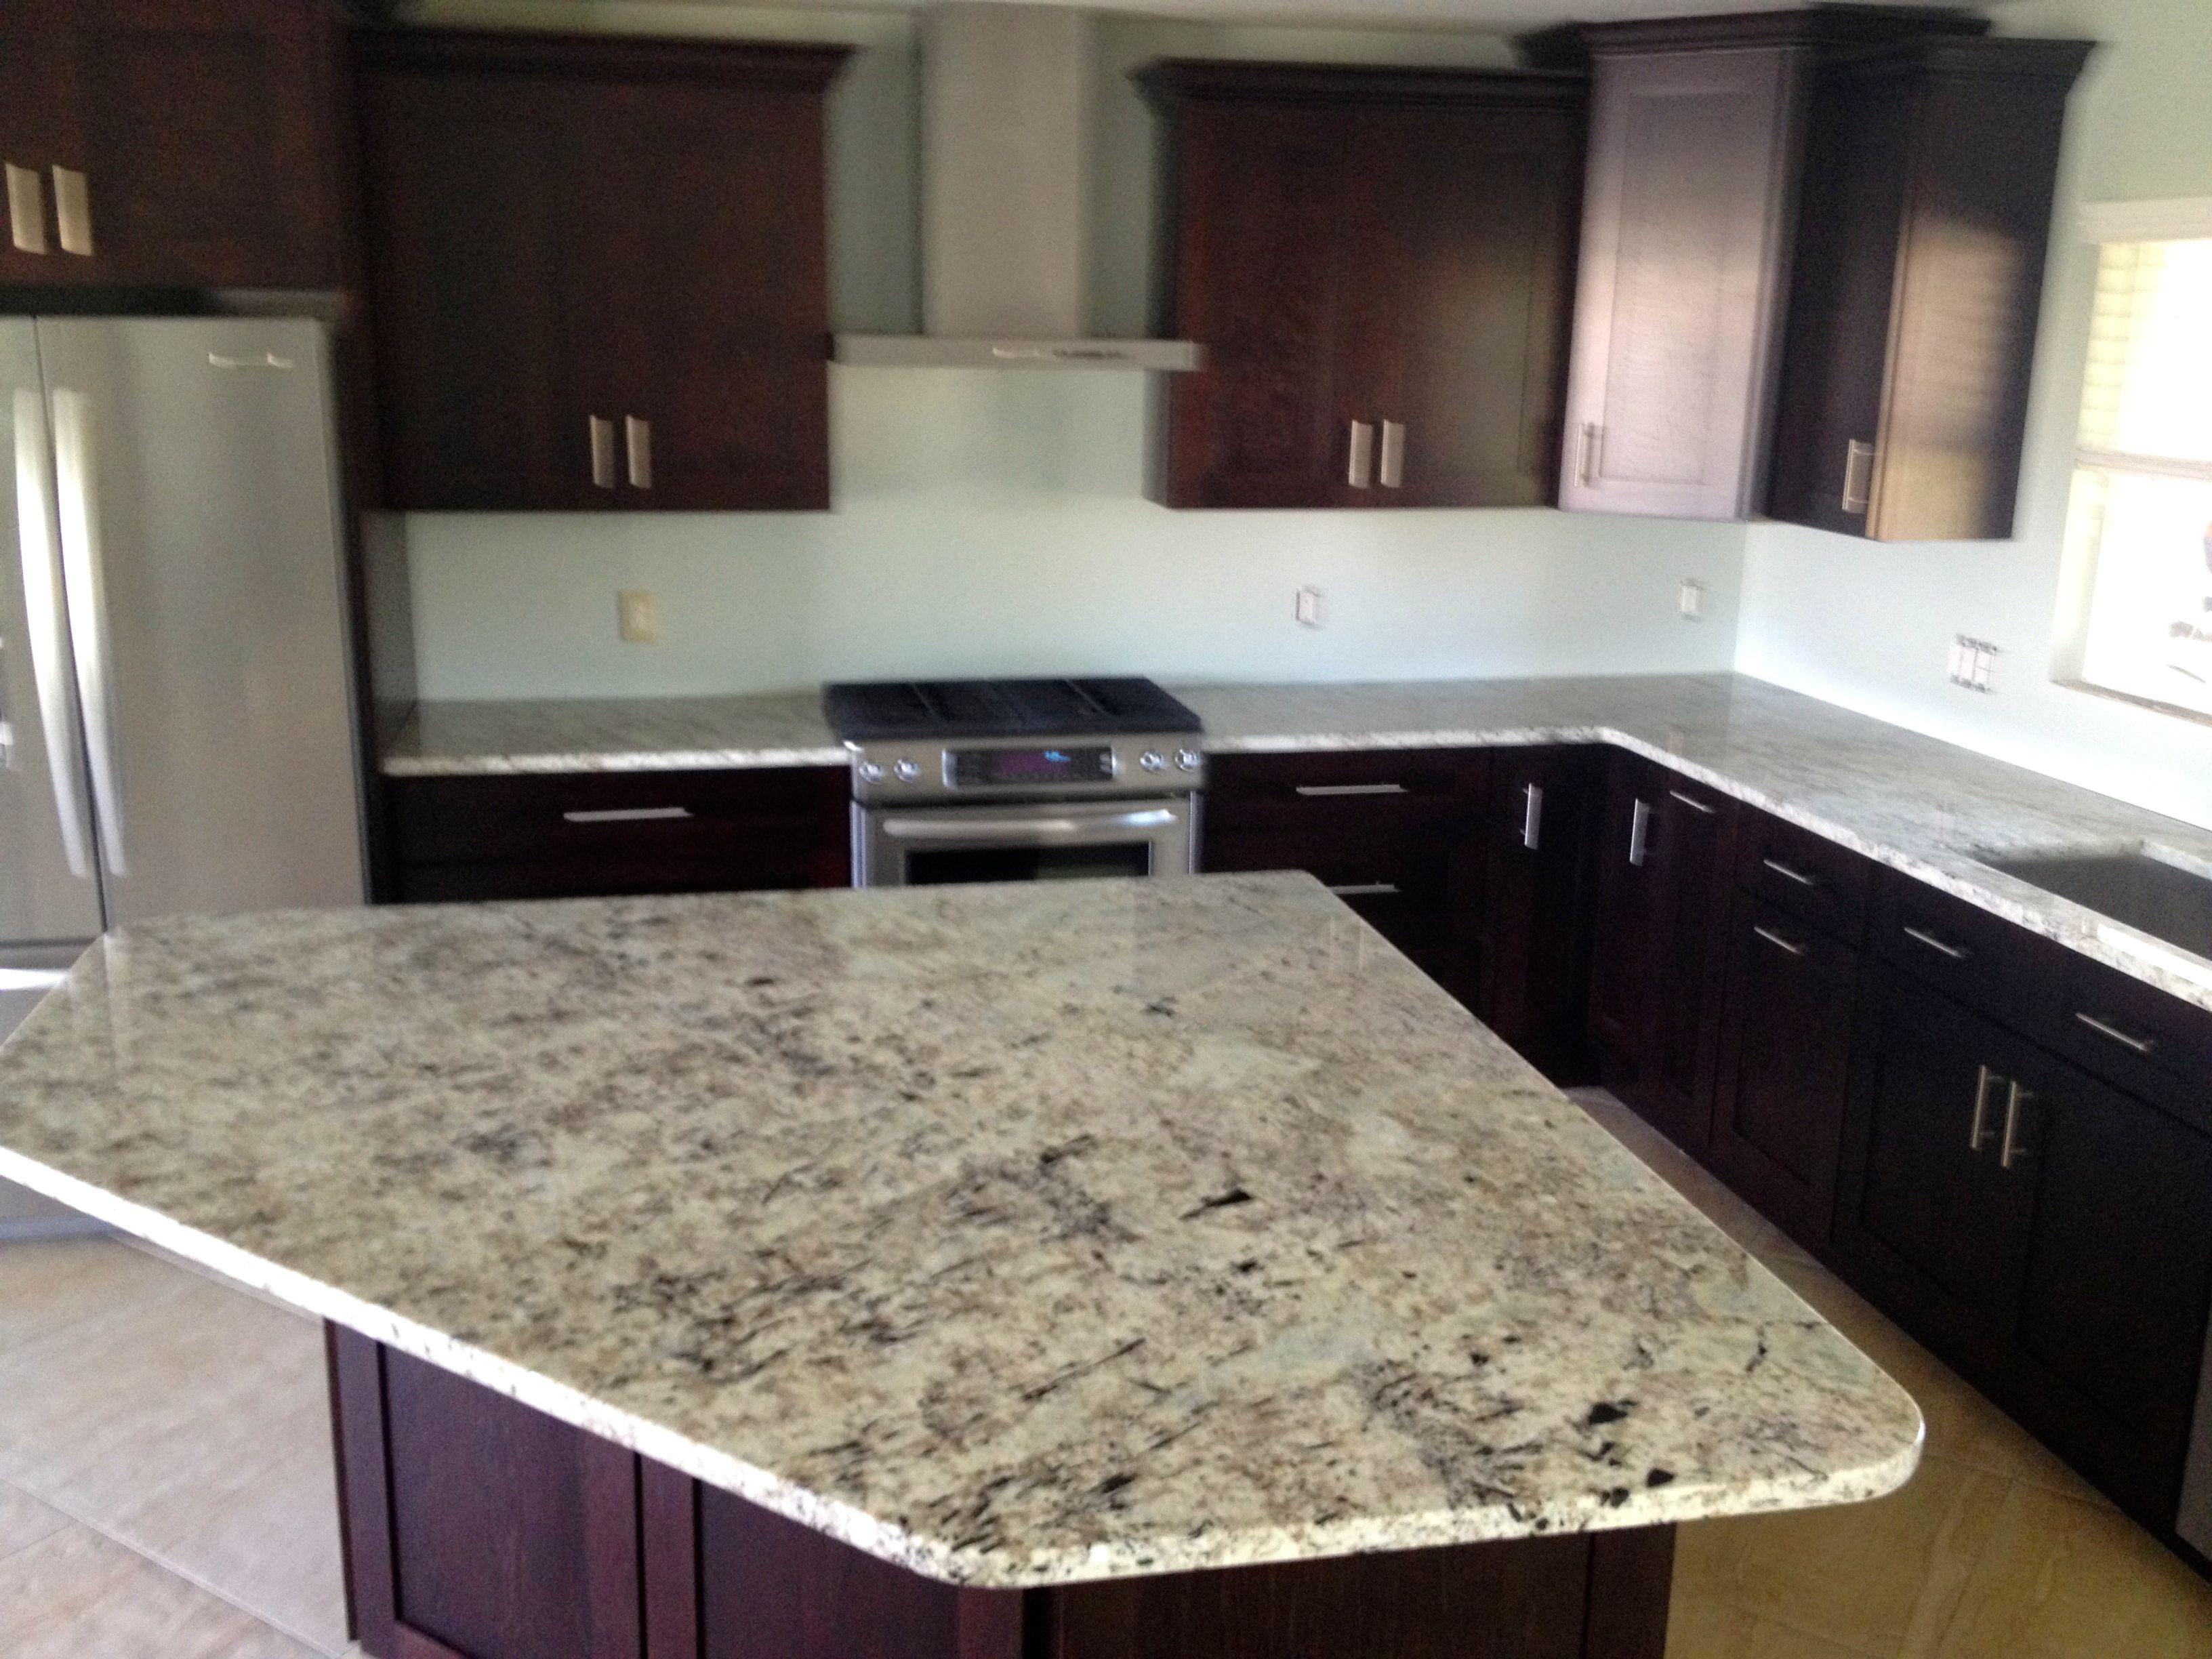 Mocha shaker cabinets modern hardware galaxy white granite tops backsplash not installed - Modern kitchen tiles hd ...